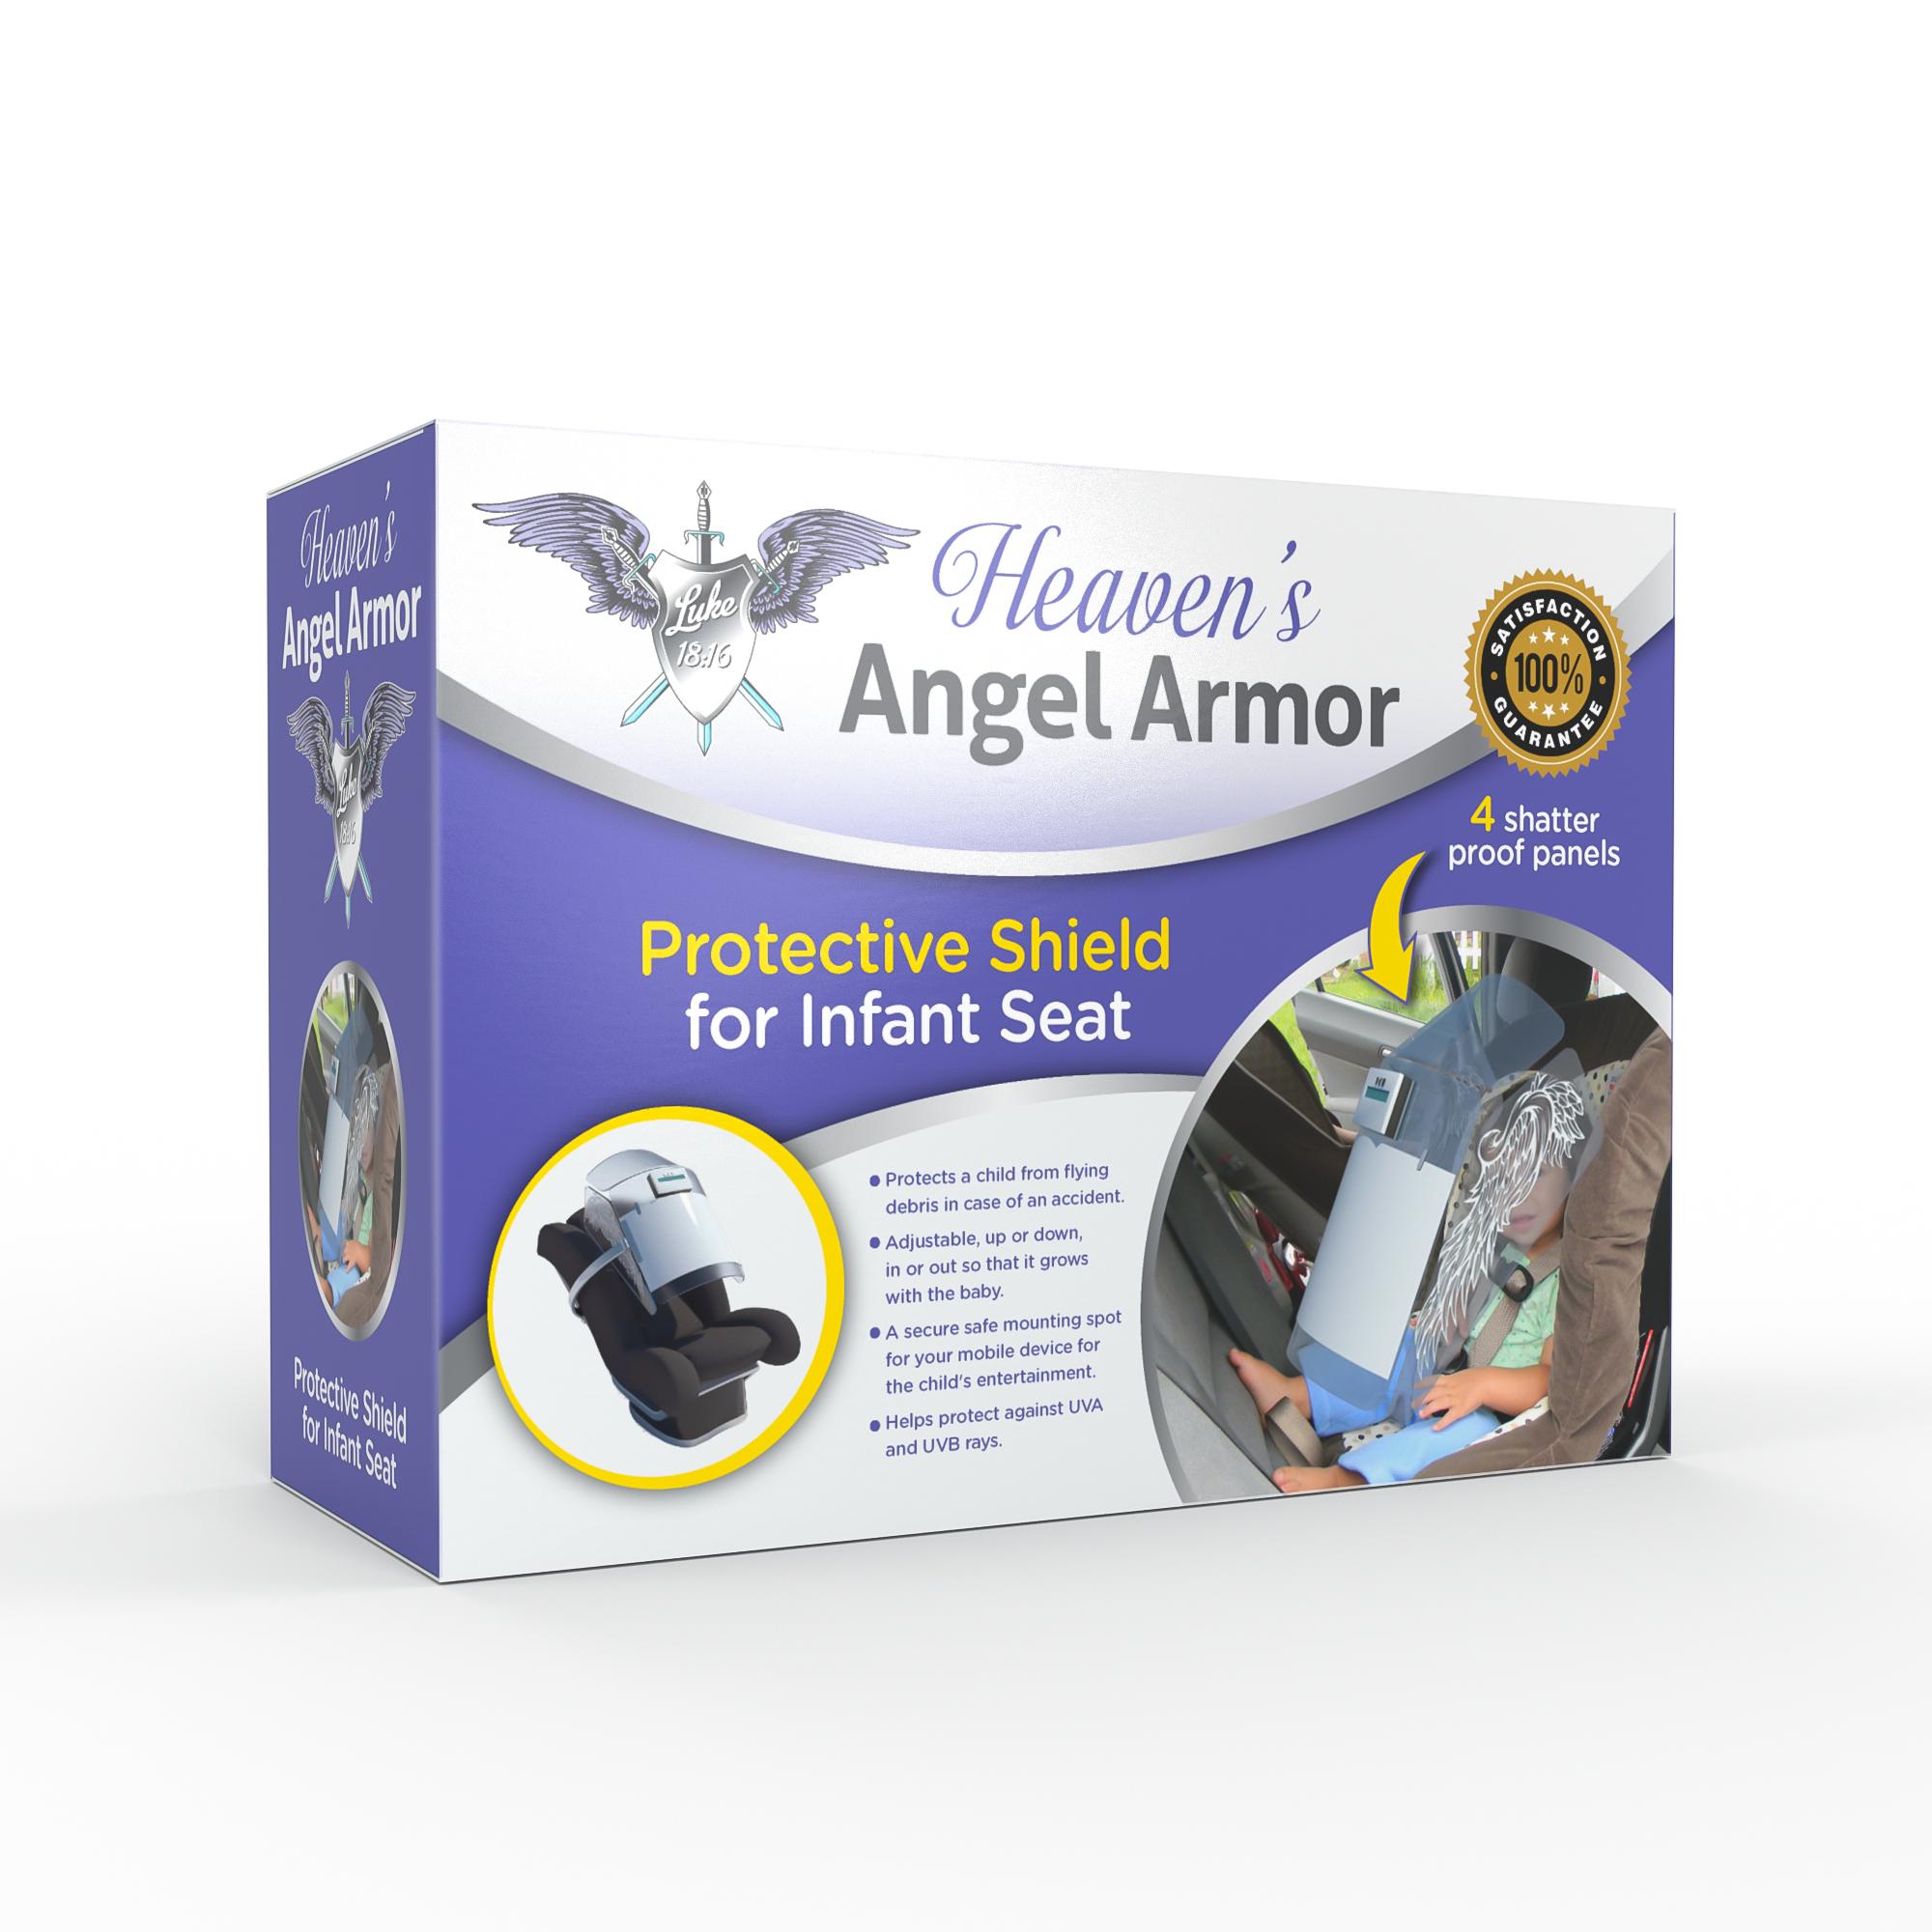 Heaven's Angel armor